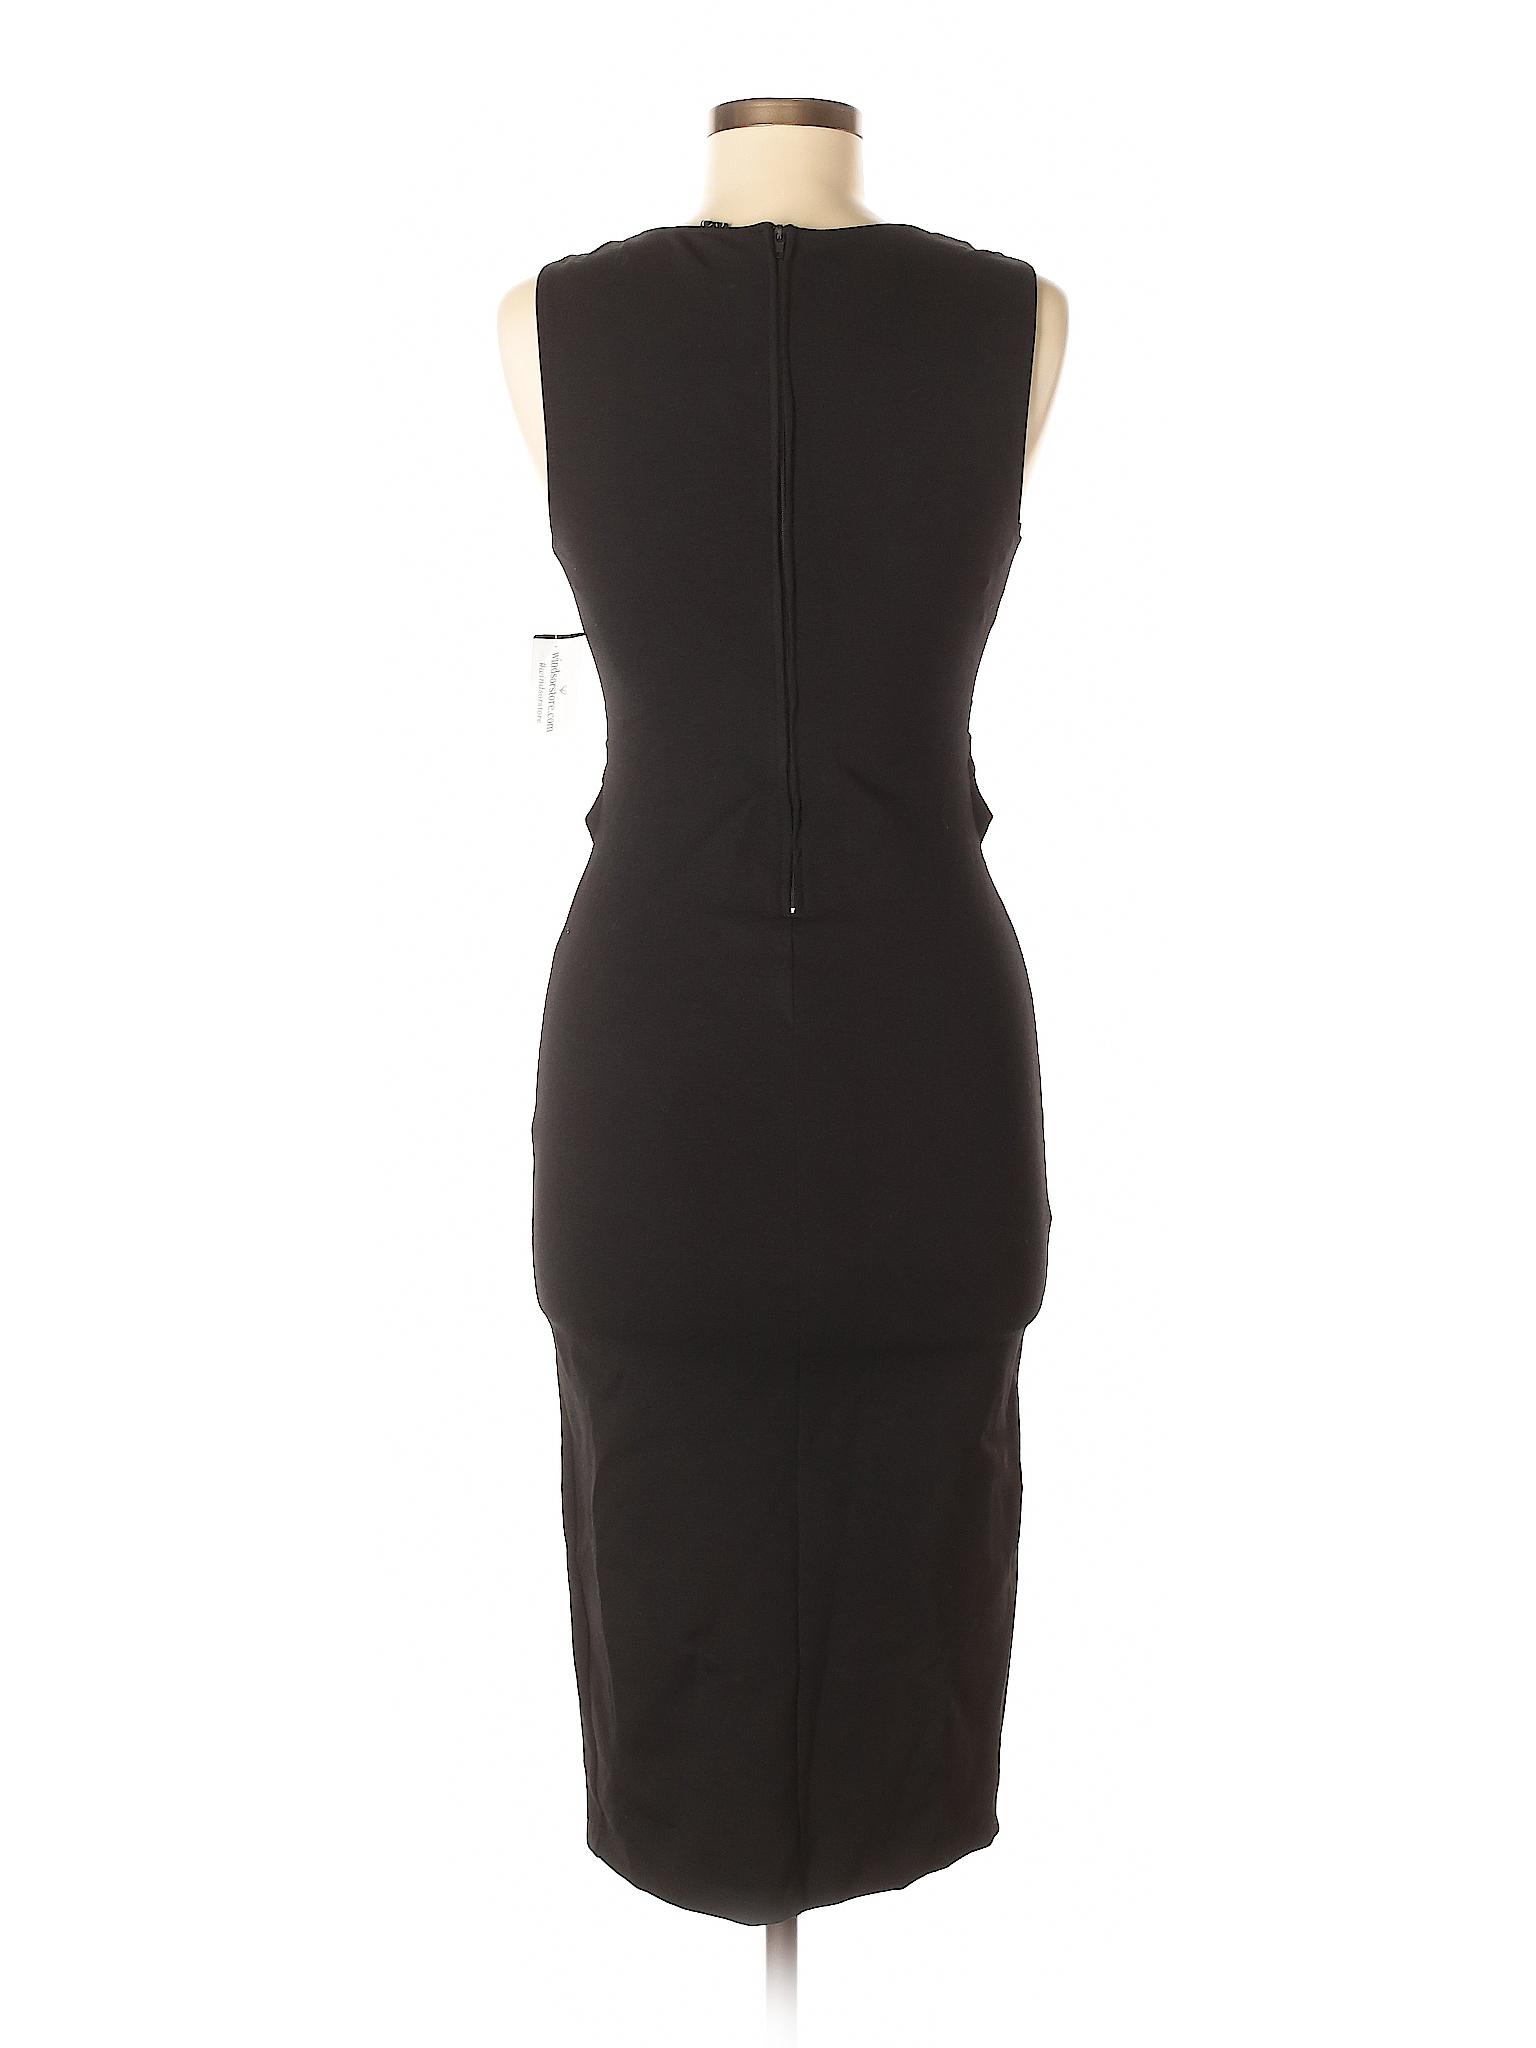 Boutique winter Dress Boutique Boutique winter Casual Casual Dress Windsor Windsor winter rgBHwSrq